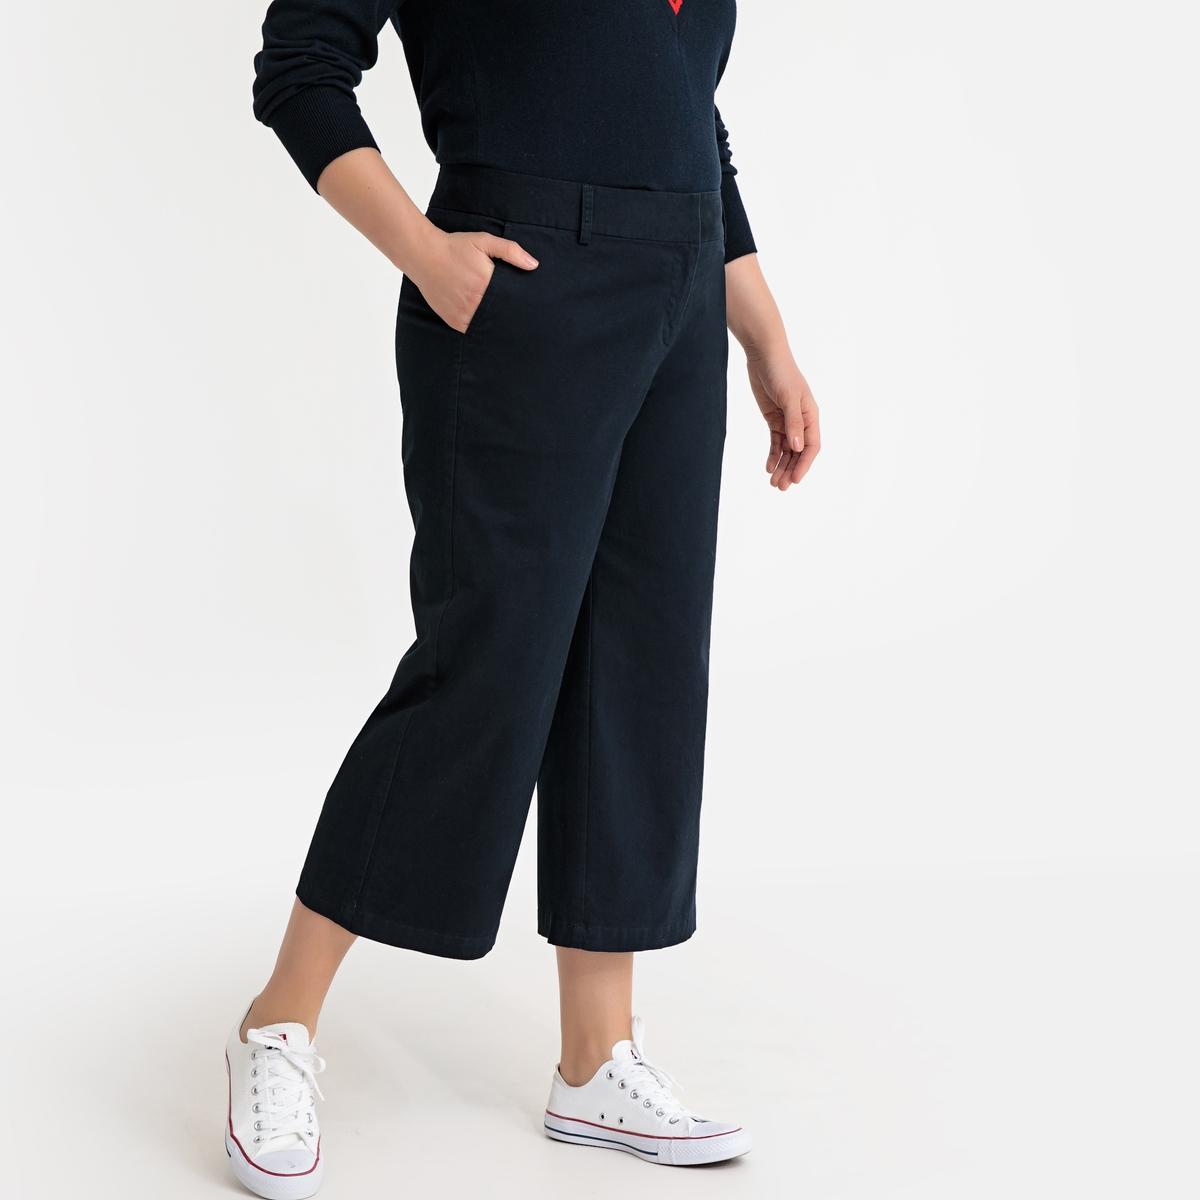 Calças curtas largas, corte chino